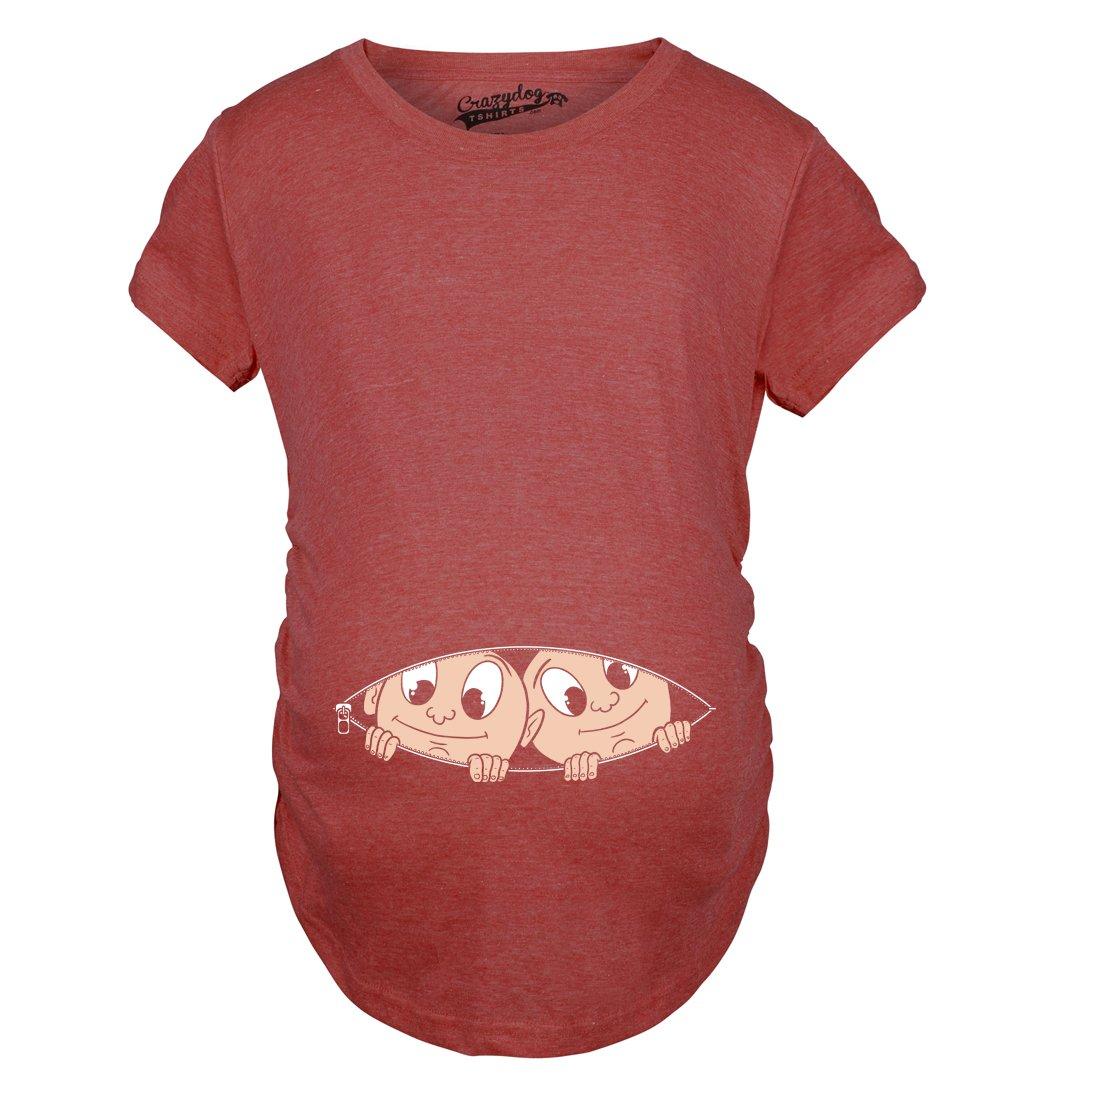 Maternity Peeking Twins T Shirt Cute Baby Announcement Pregnancy Tee Crazy Dog Tshirts 99caucasianTWINSmat